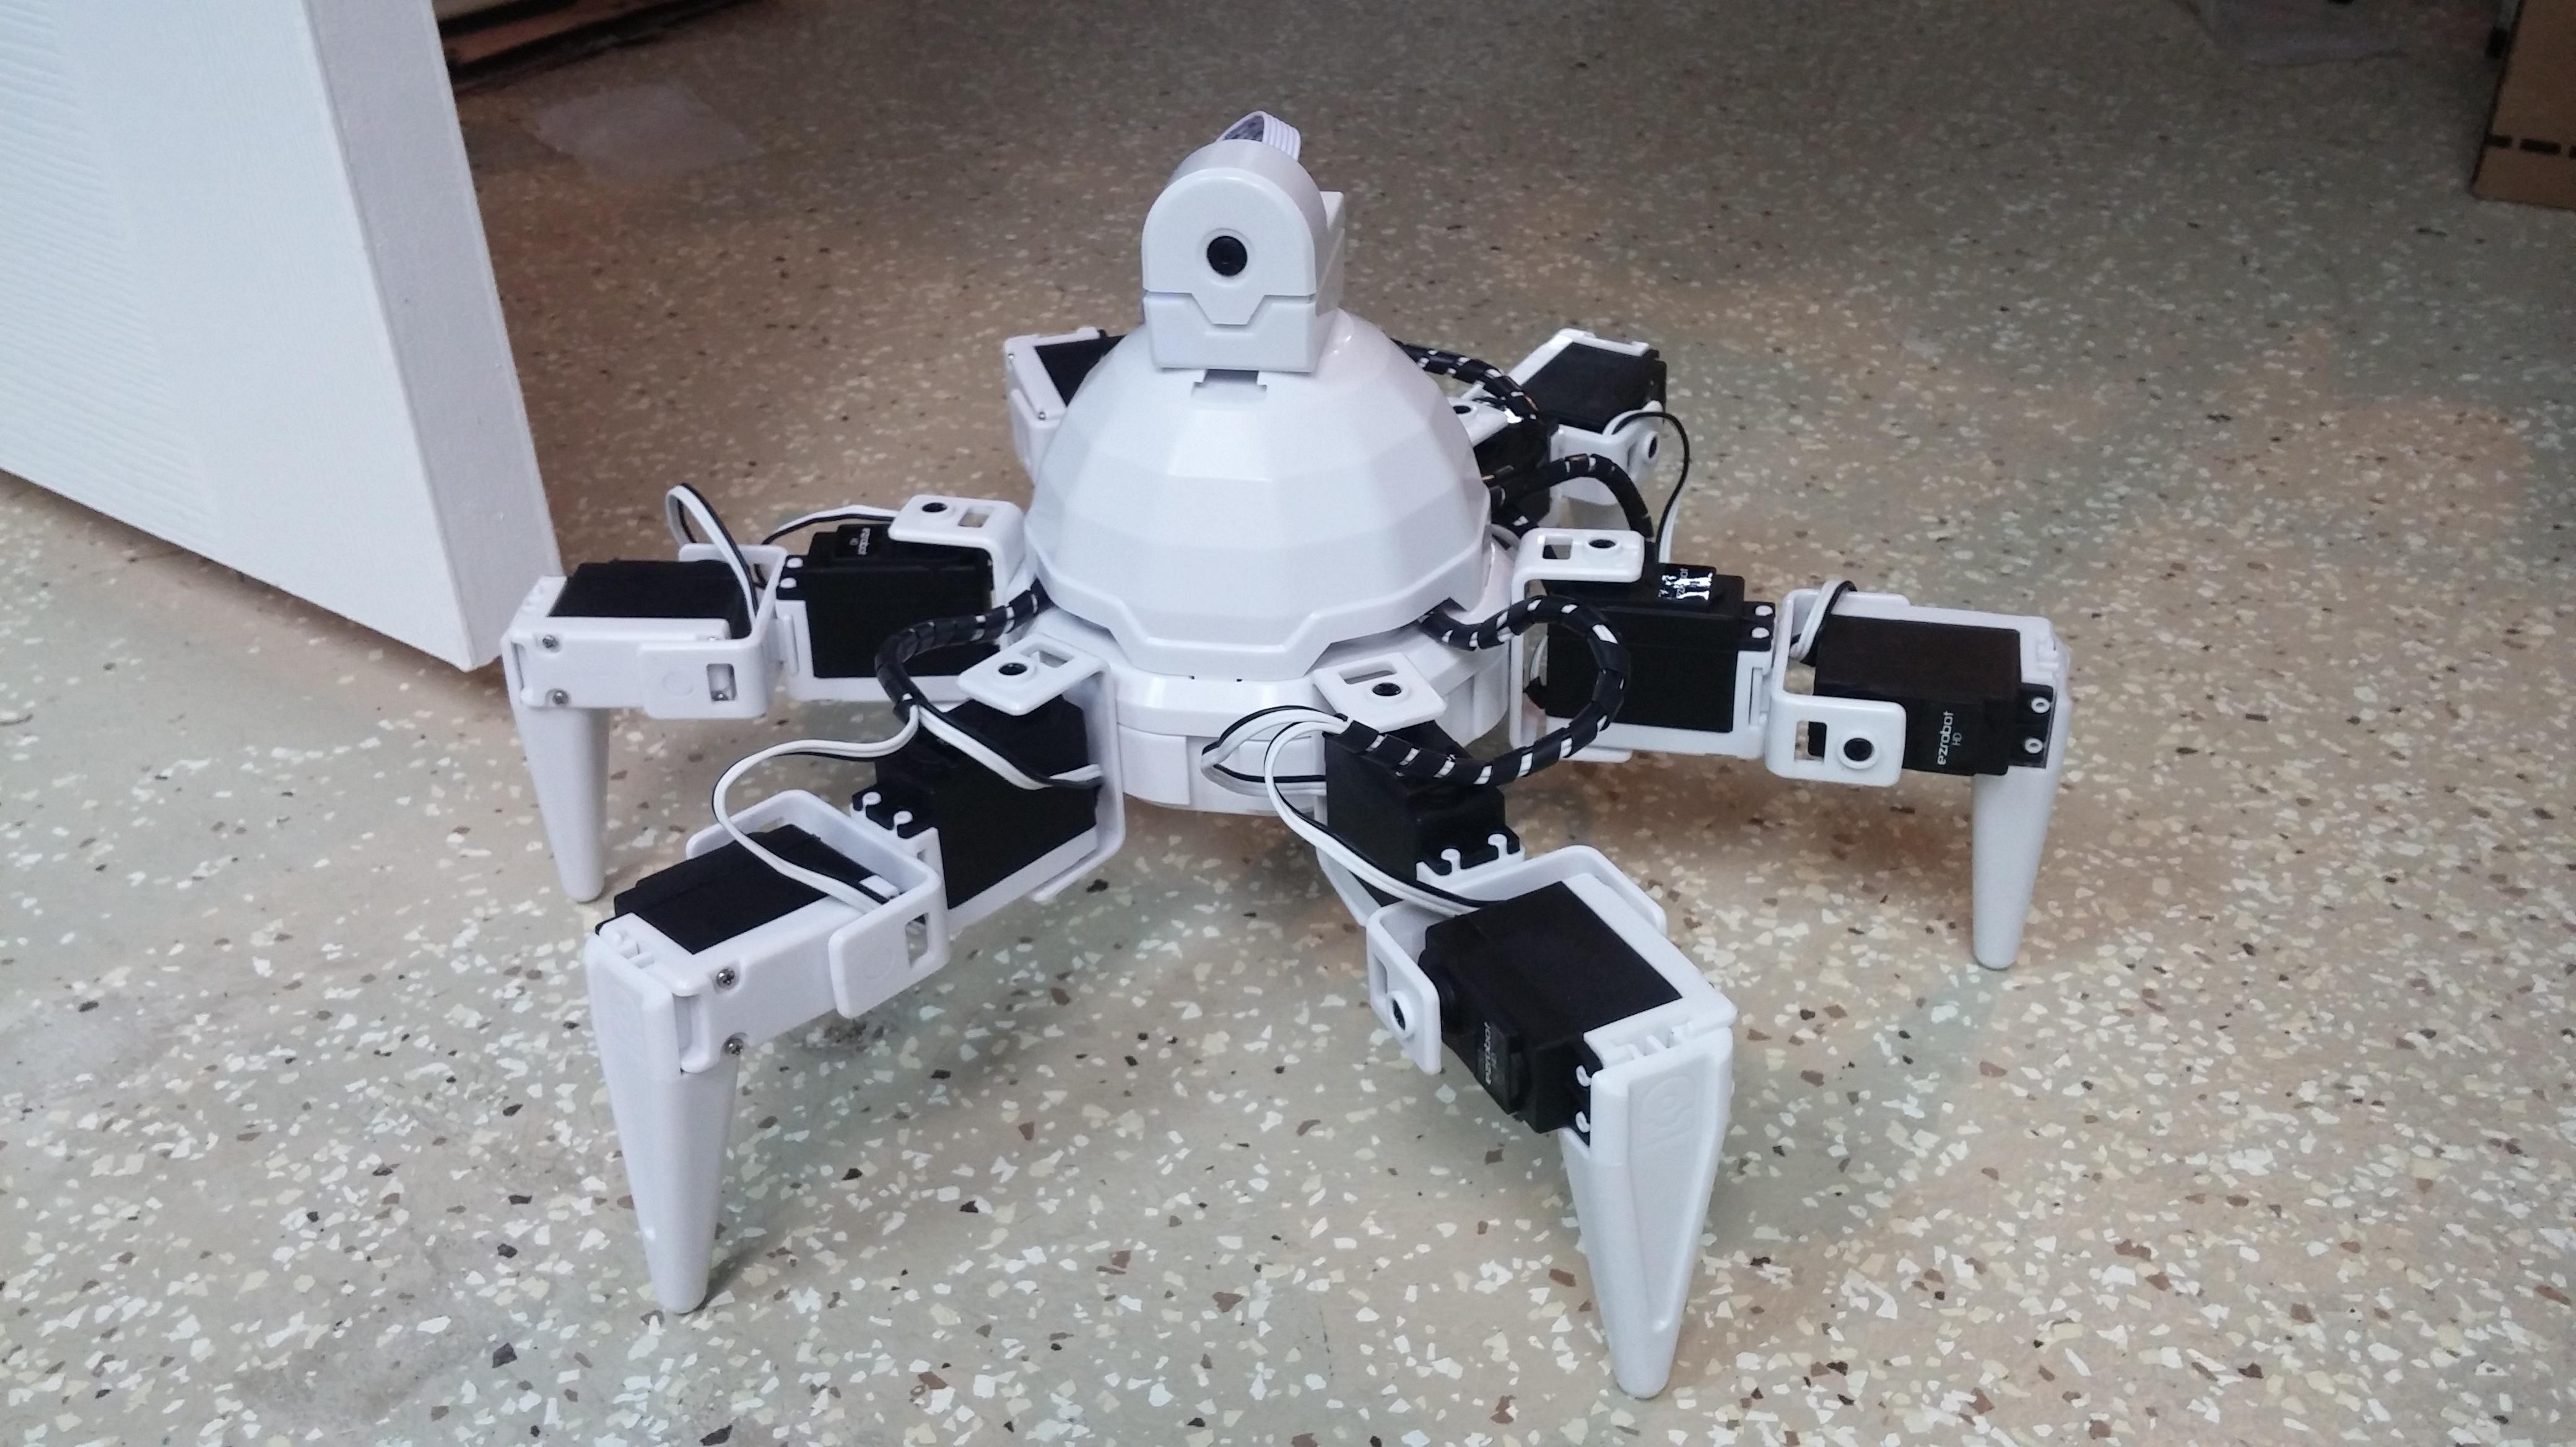 Review: EZ-Robot Six and the EZ-Builder Software